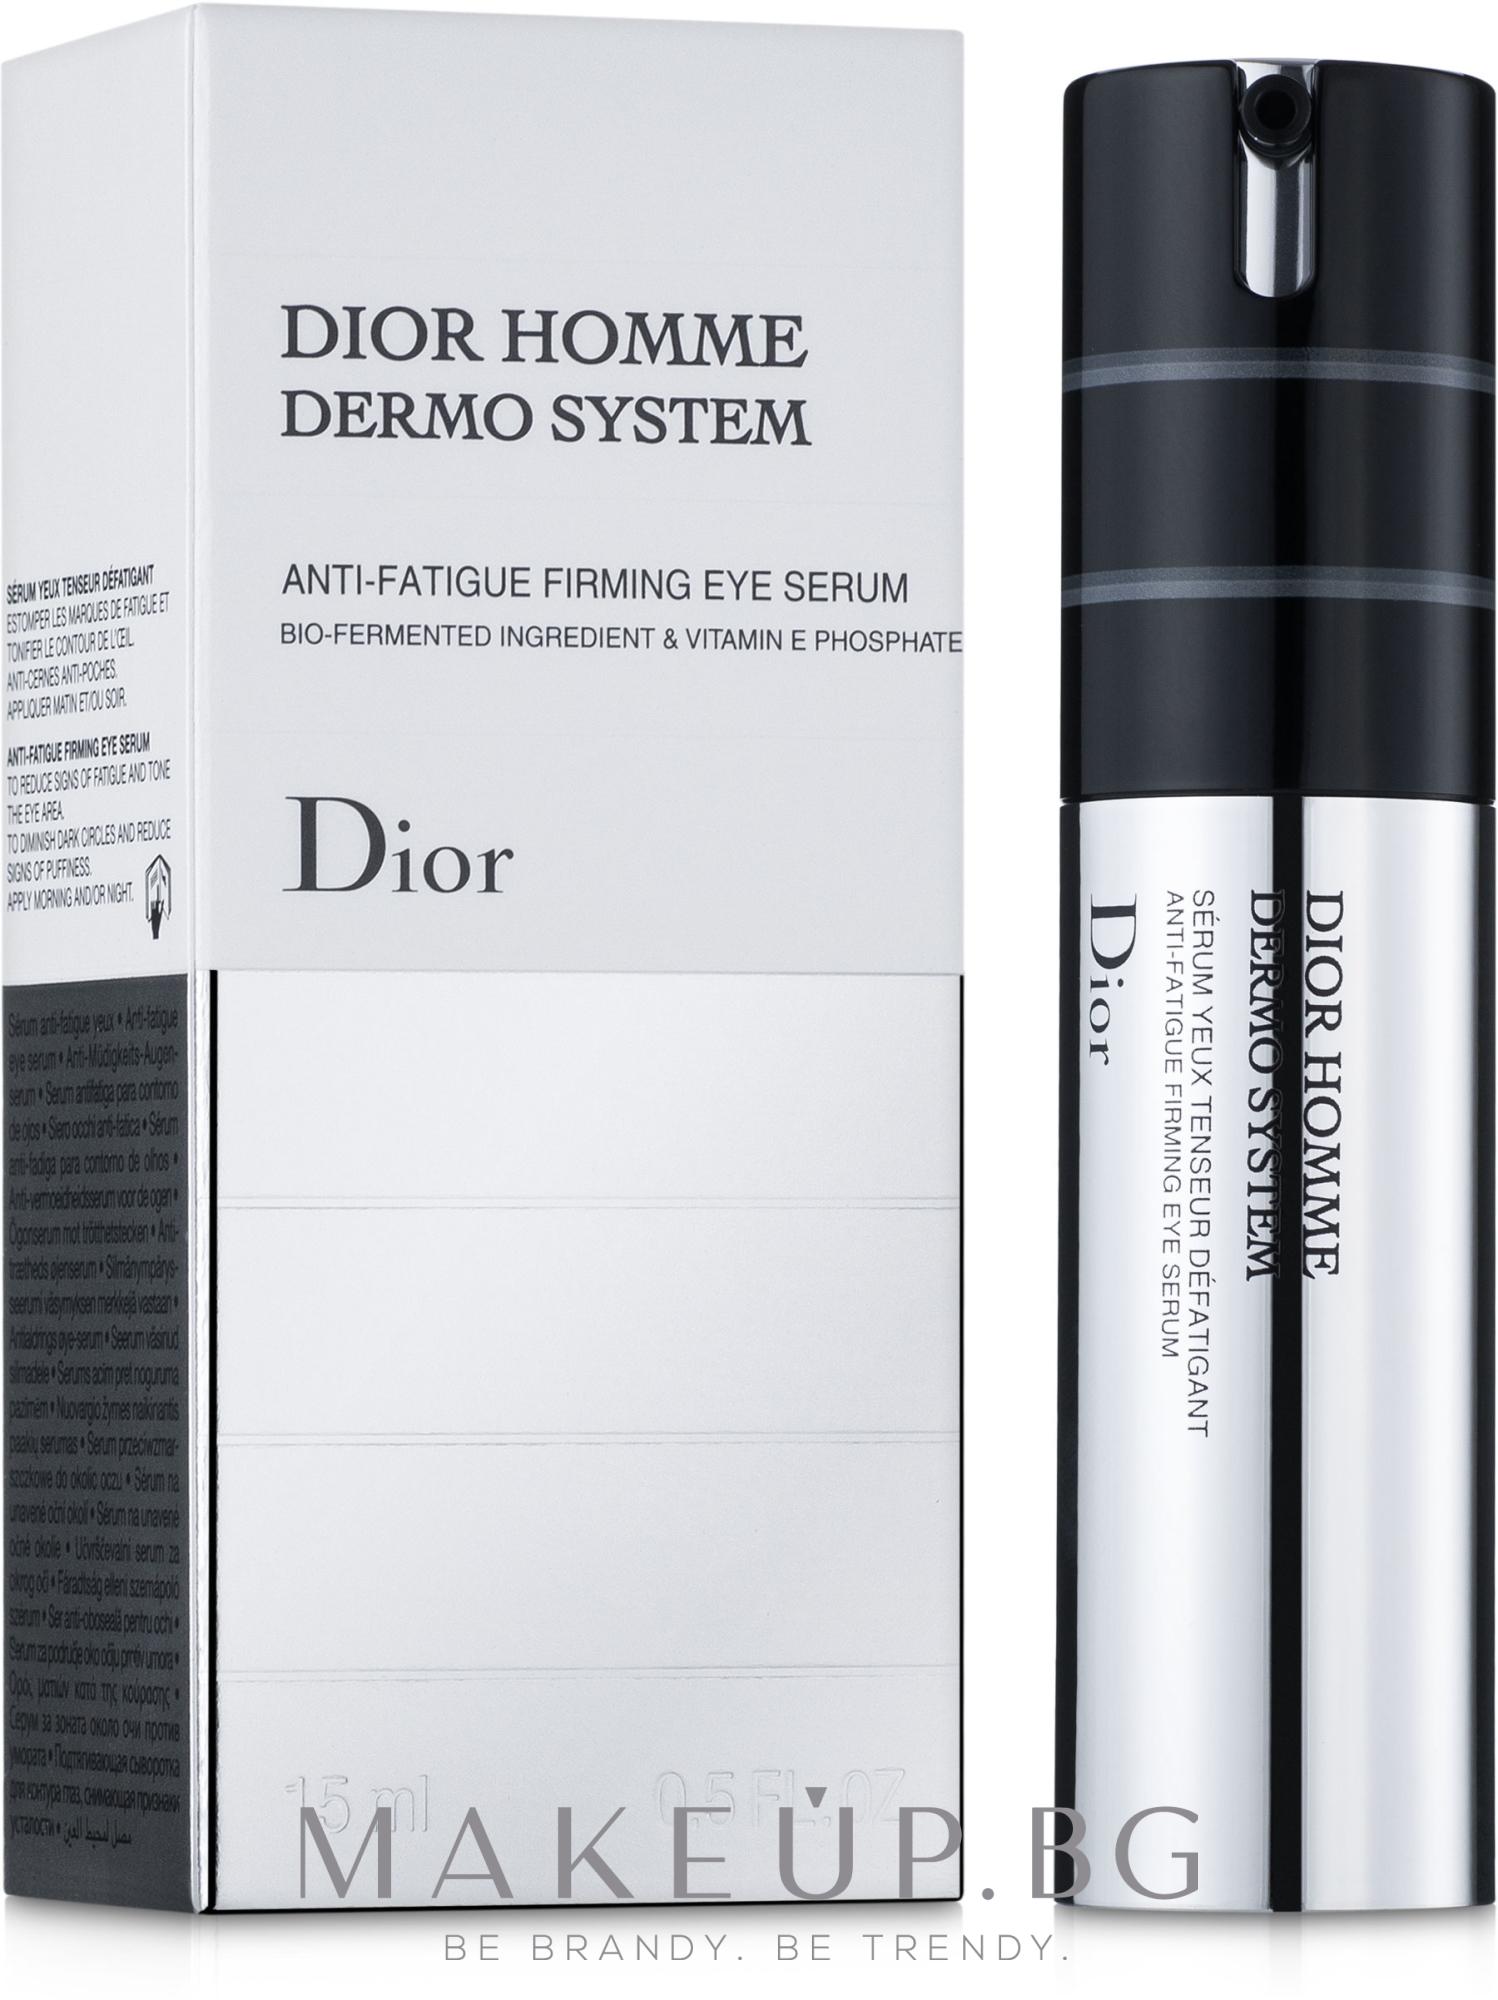 Стягащ и укрепващ околоочен серум за мъже - Dior Homme Dermo System Eye Serum 15ml — снимка 15 ml